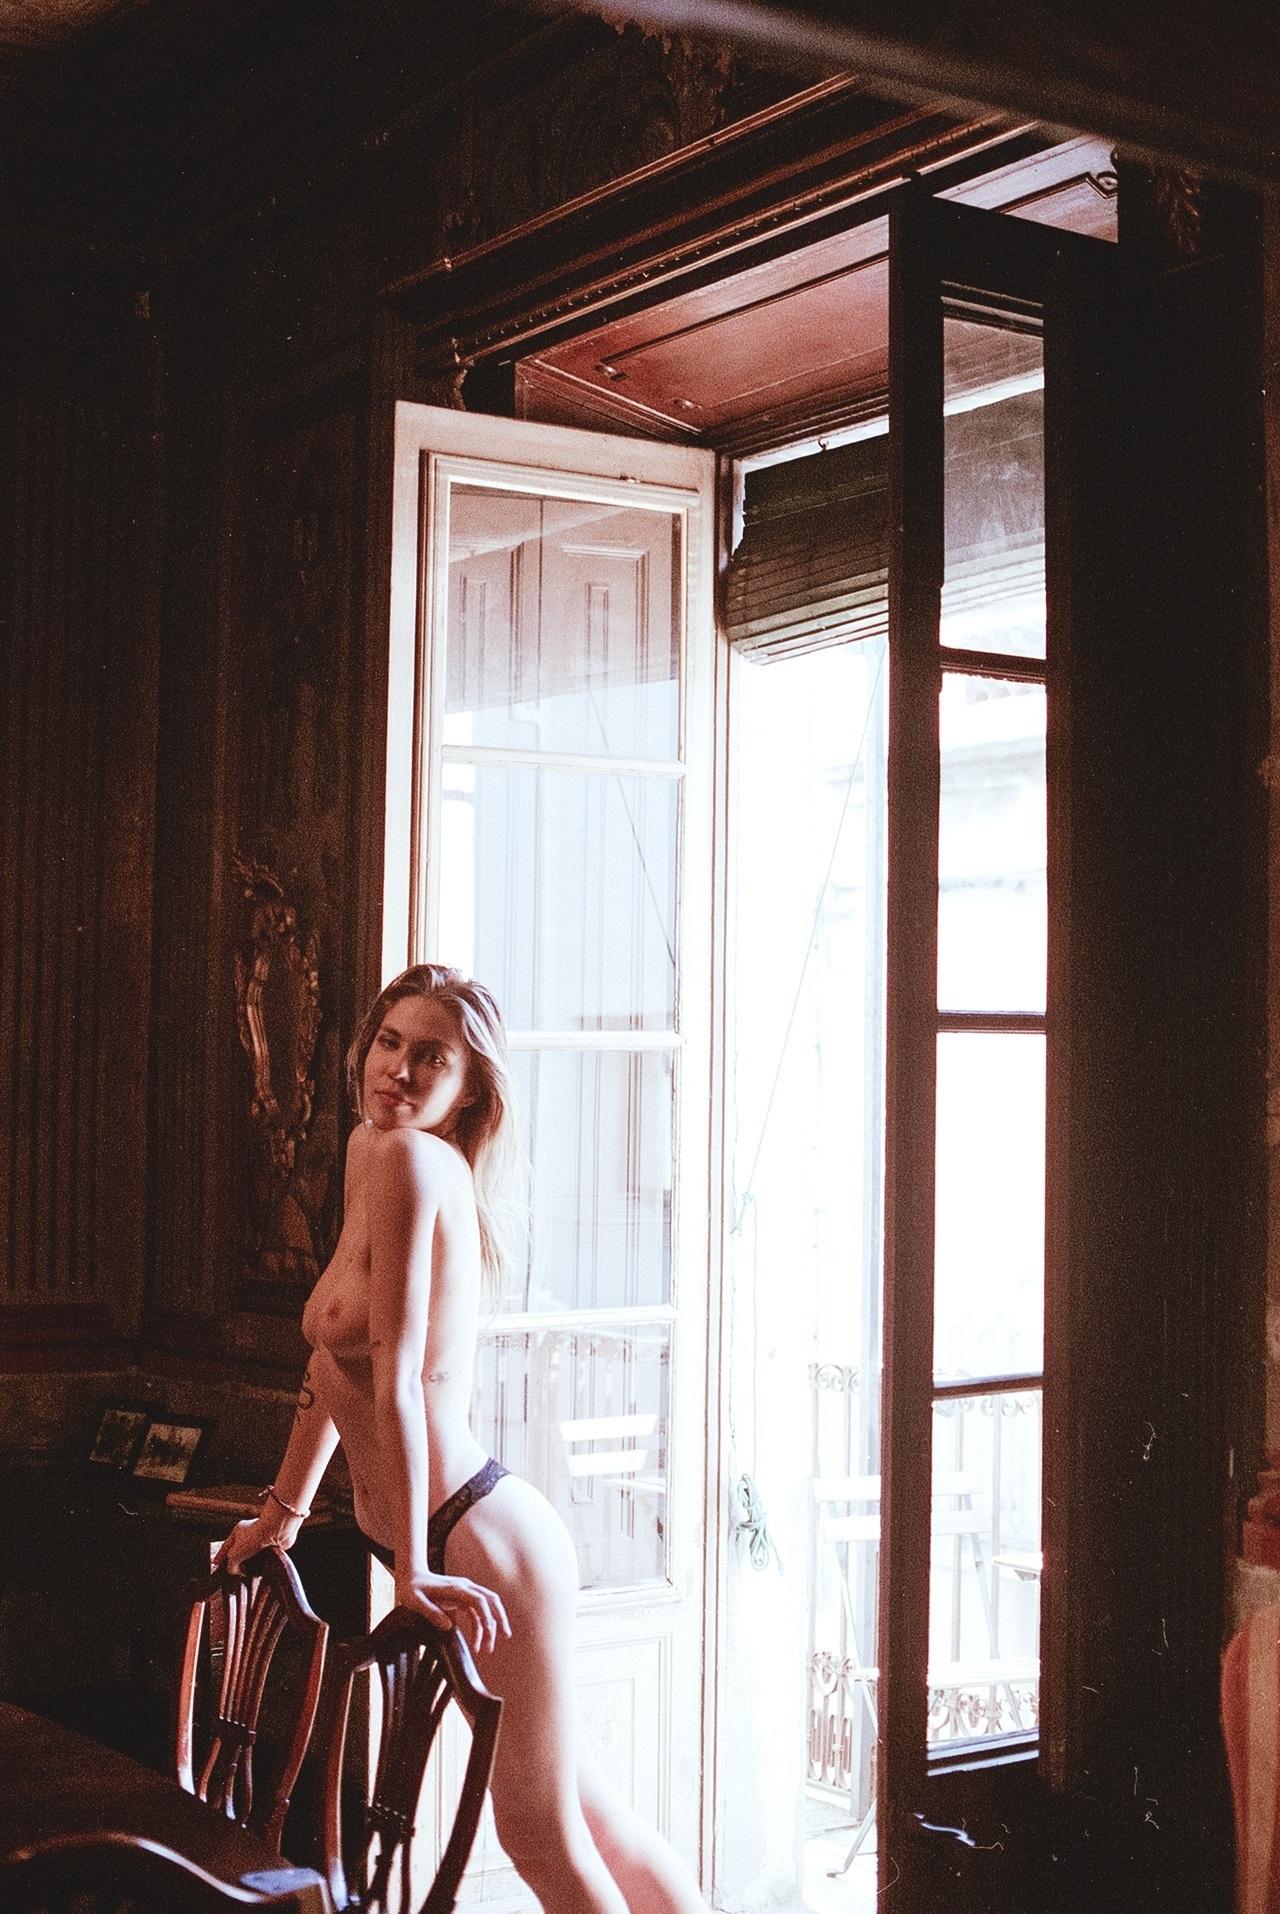 Julia Majewska - Marcel Boer photoshoot